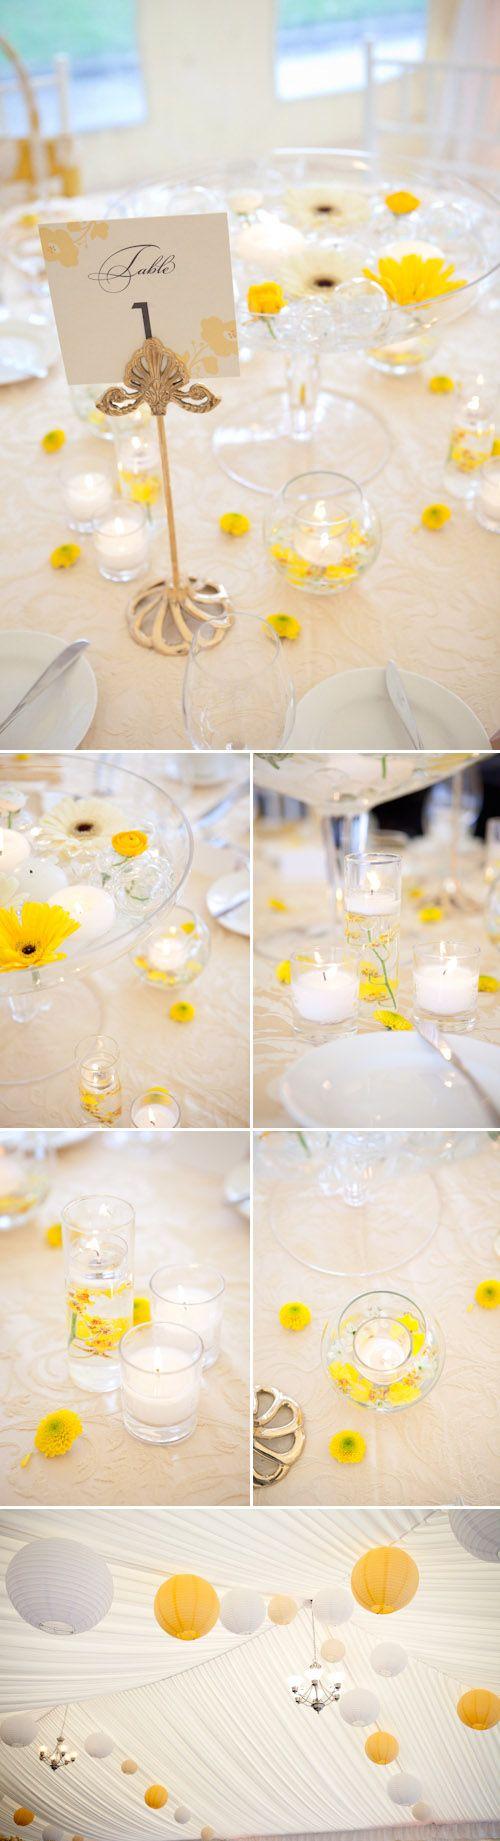 Yellow daffodil wedding theme. I love yellow and will definitely ...